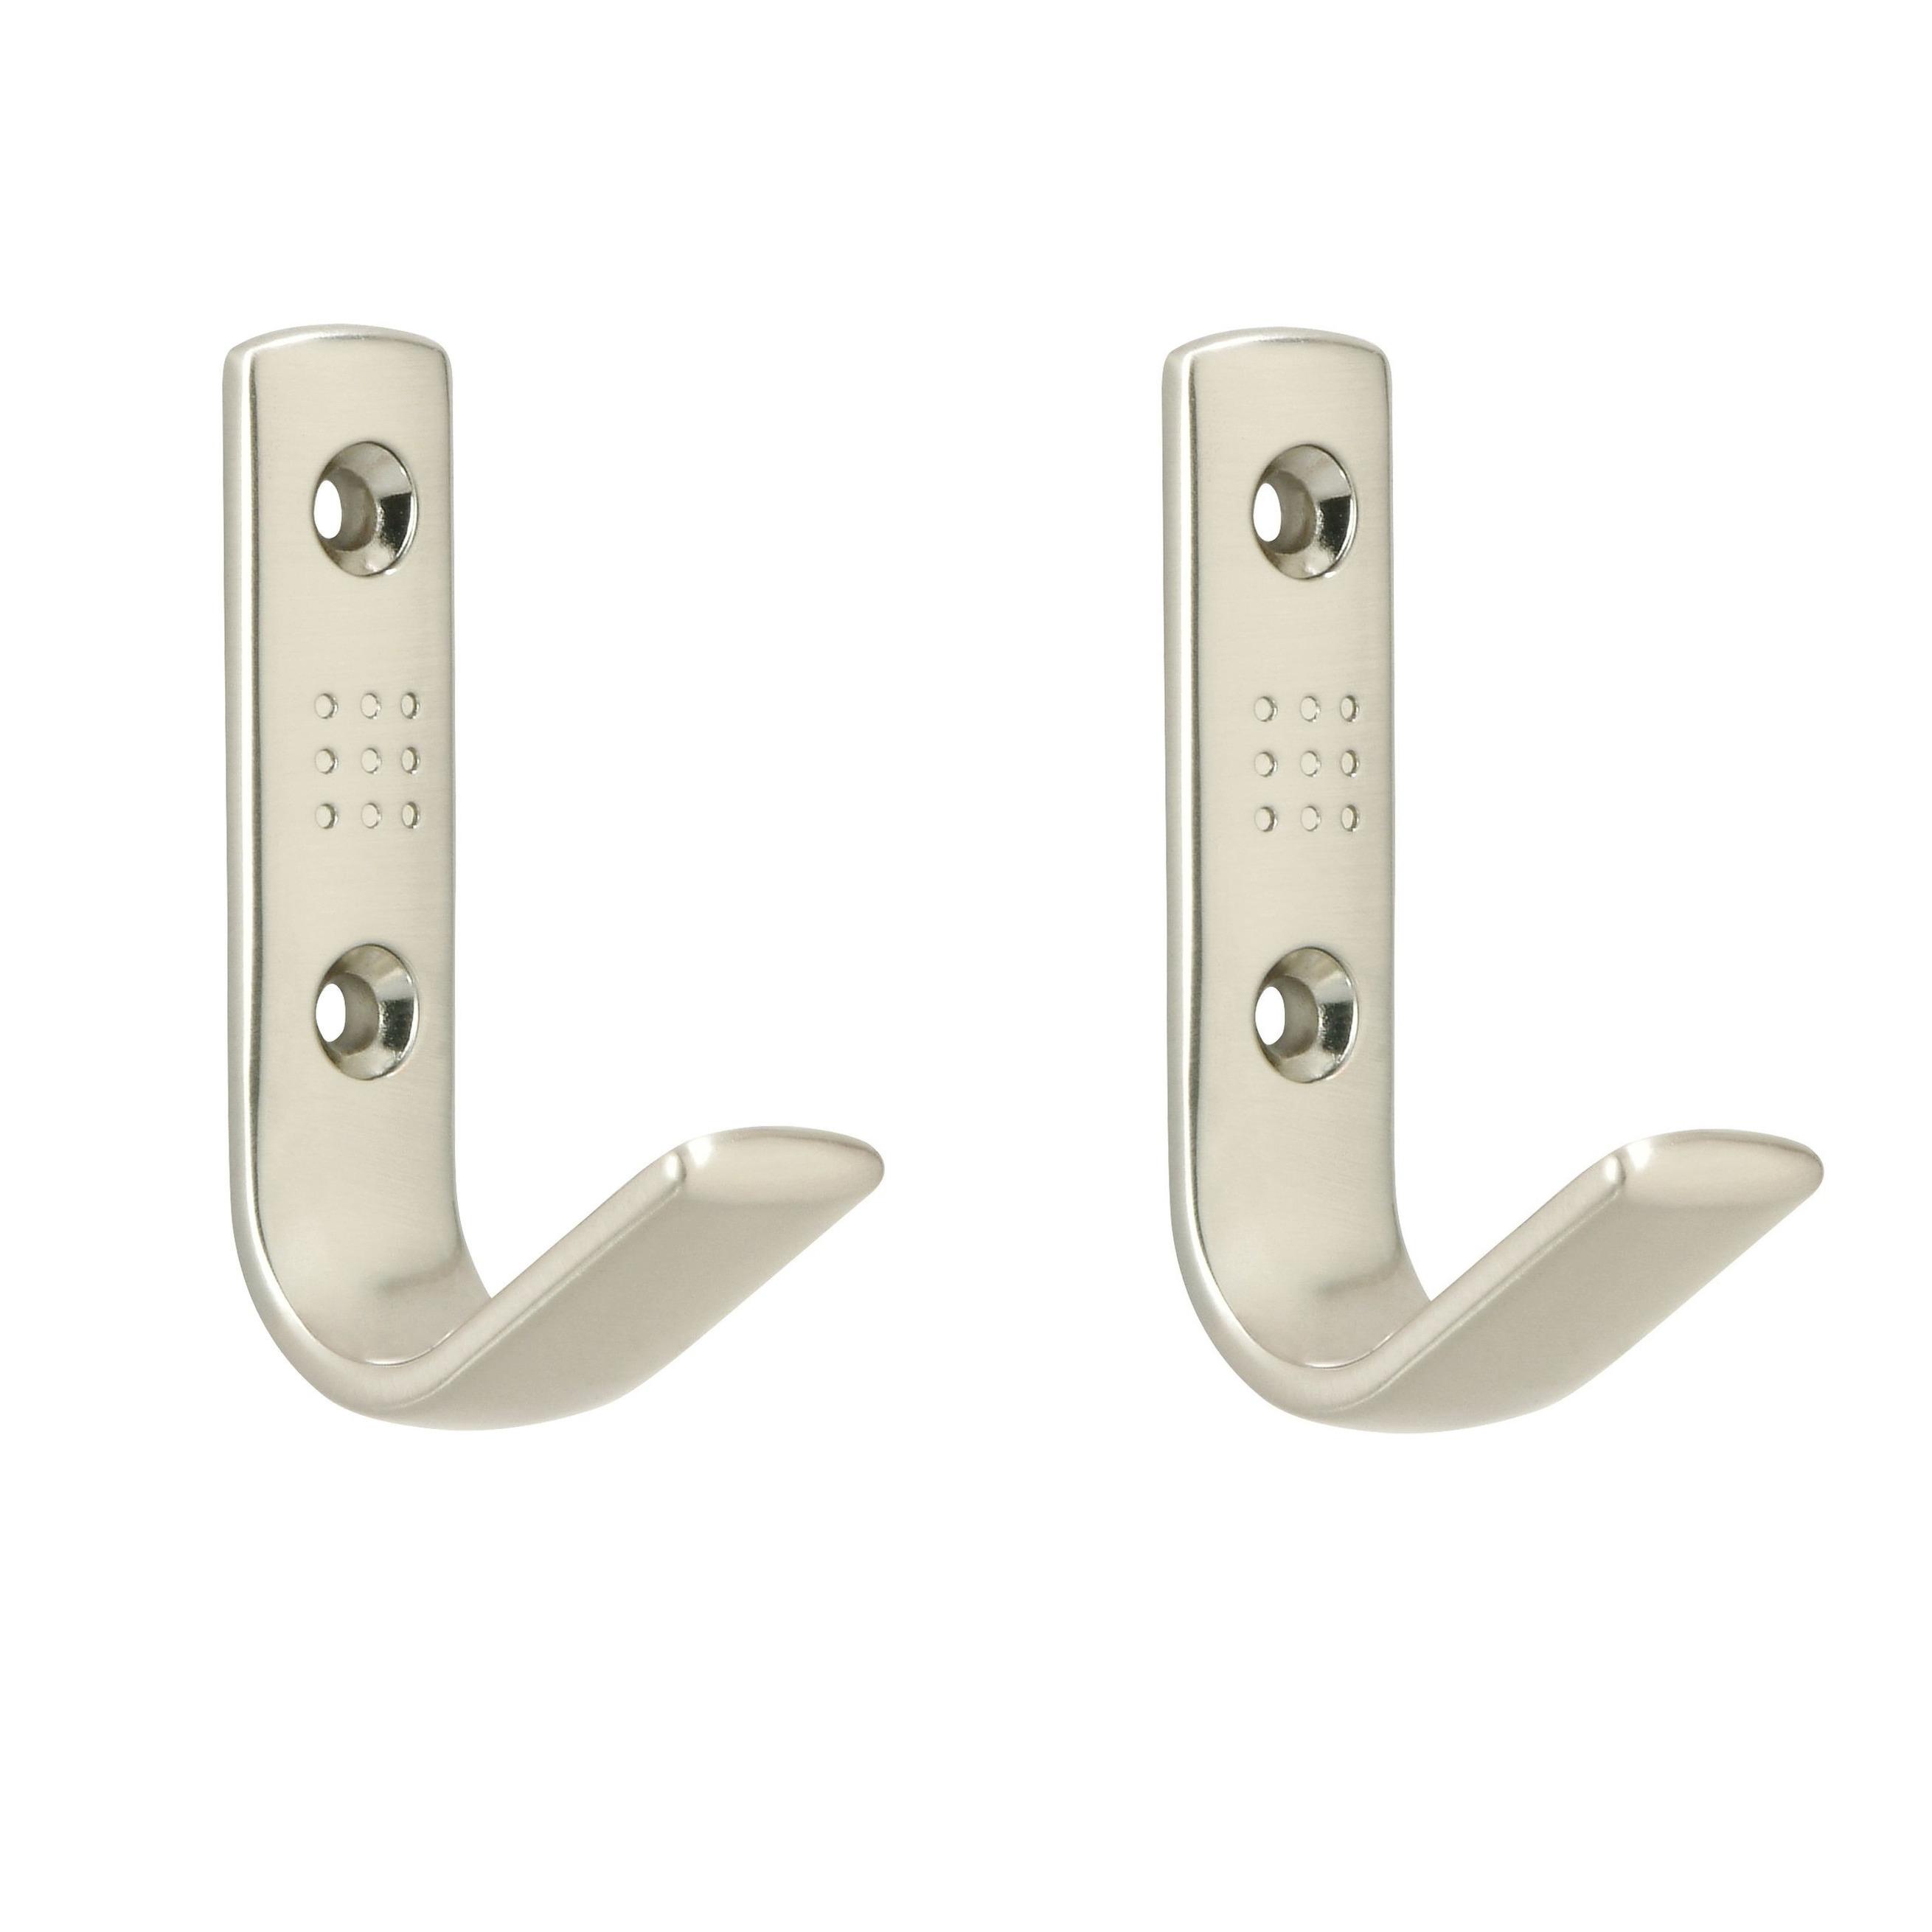 2x Zilveren garderobe haakjes-jashaken-kapstokhaakjes zamac met dubbele haak 4,6 x 7 cm